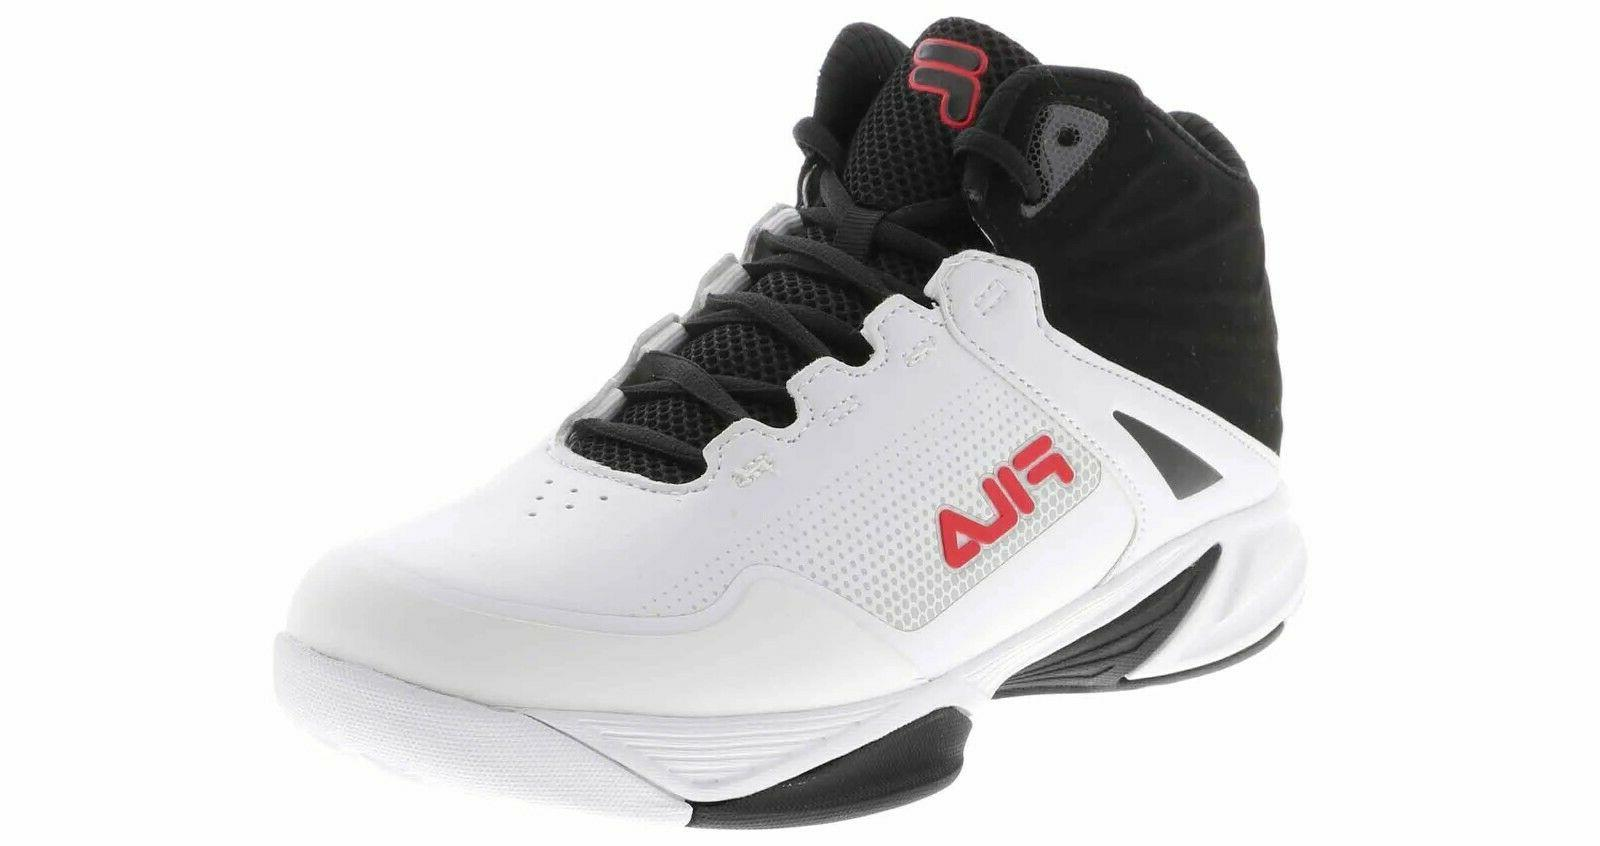 Fila Torranado 5 Men's Basketball Shoe